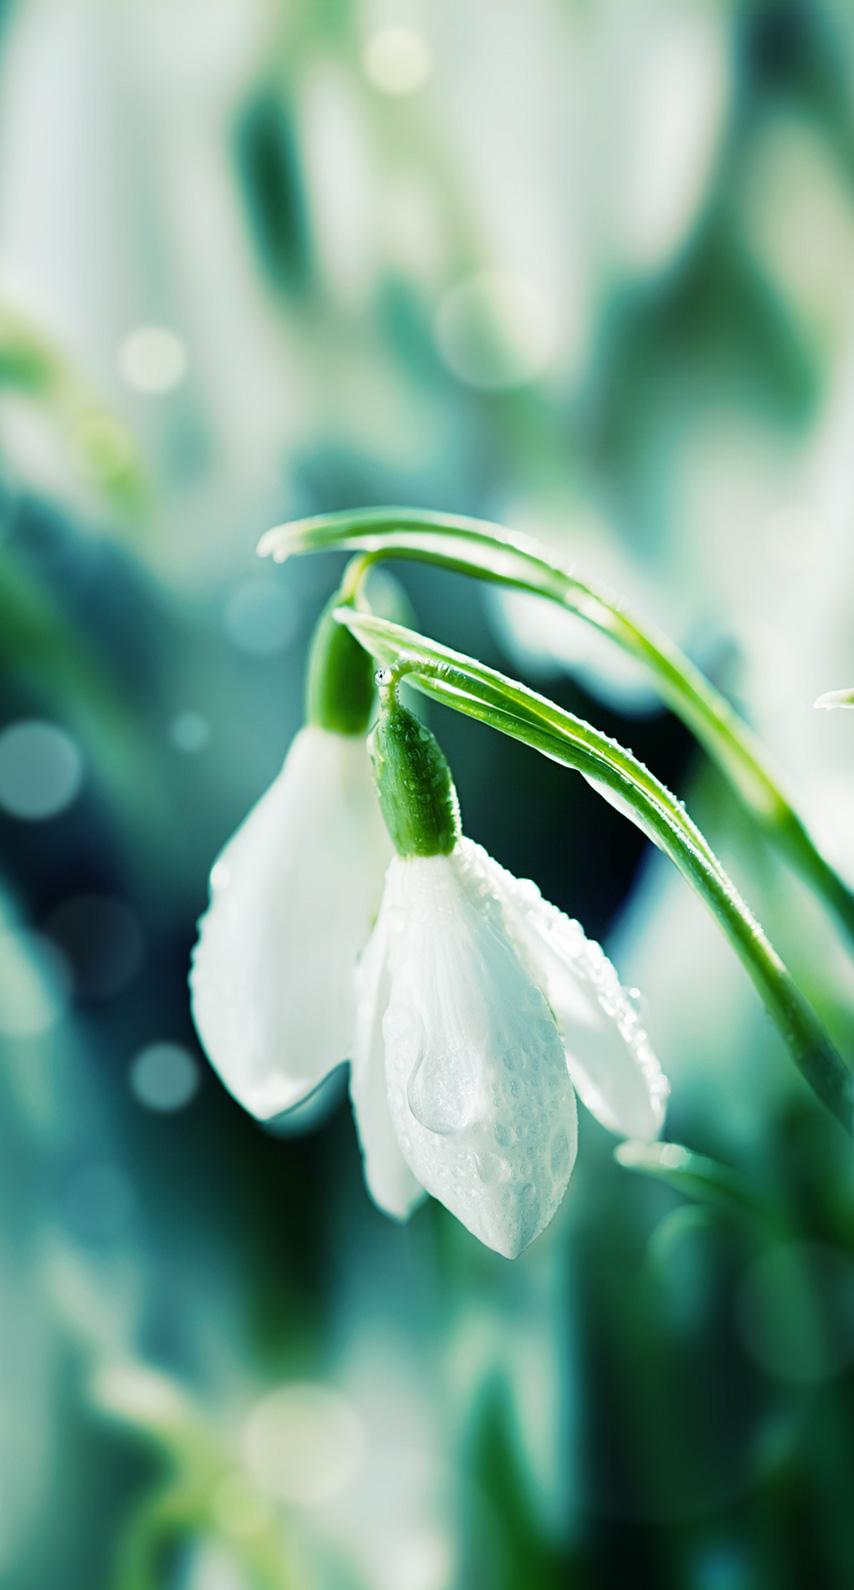 purity, growth